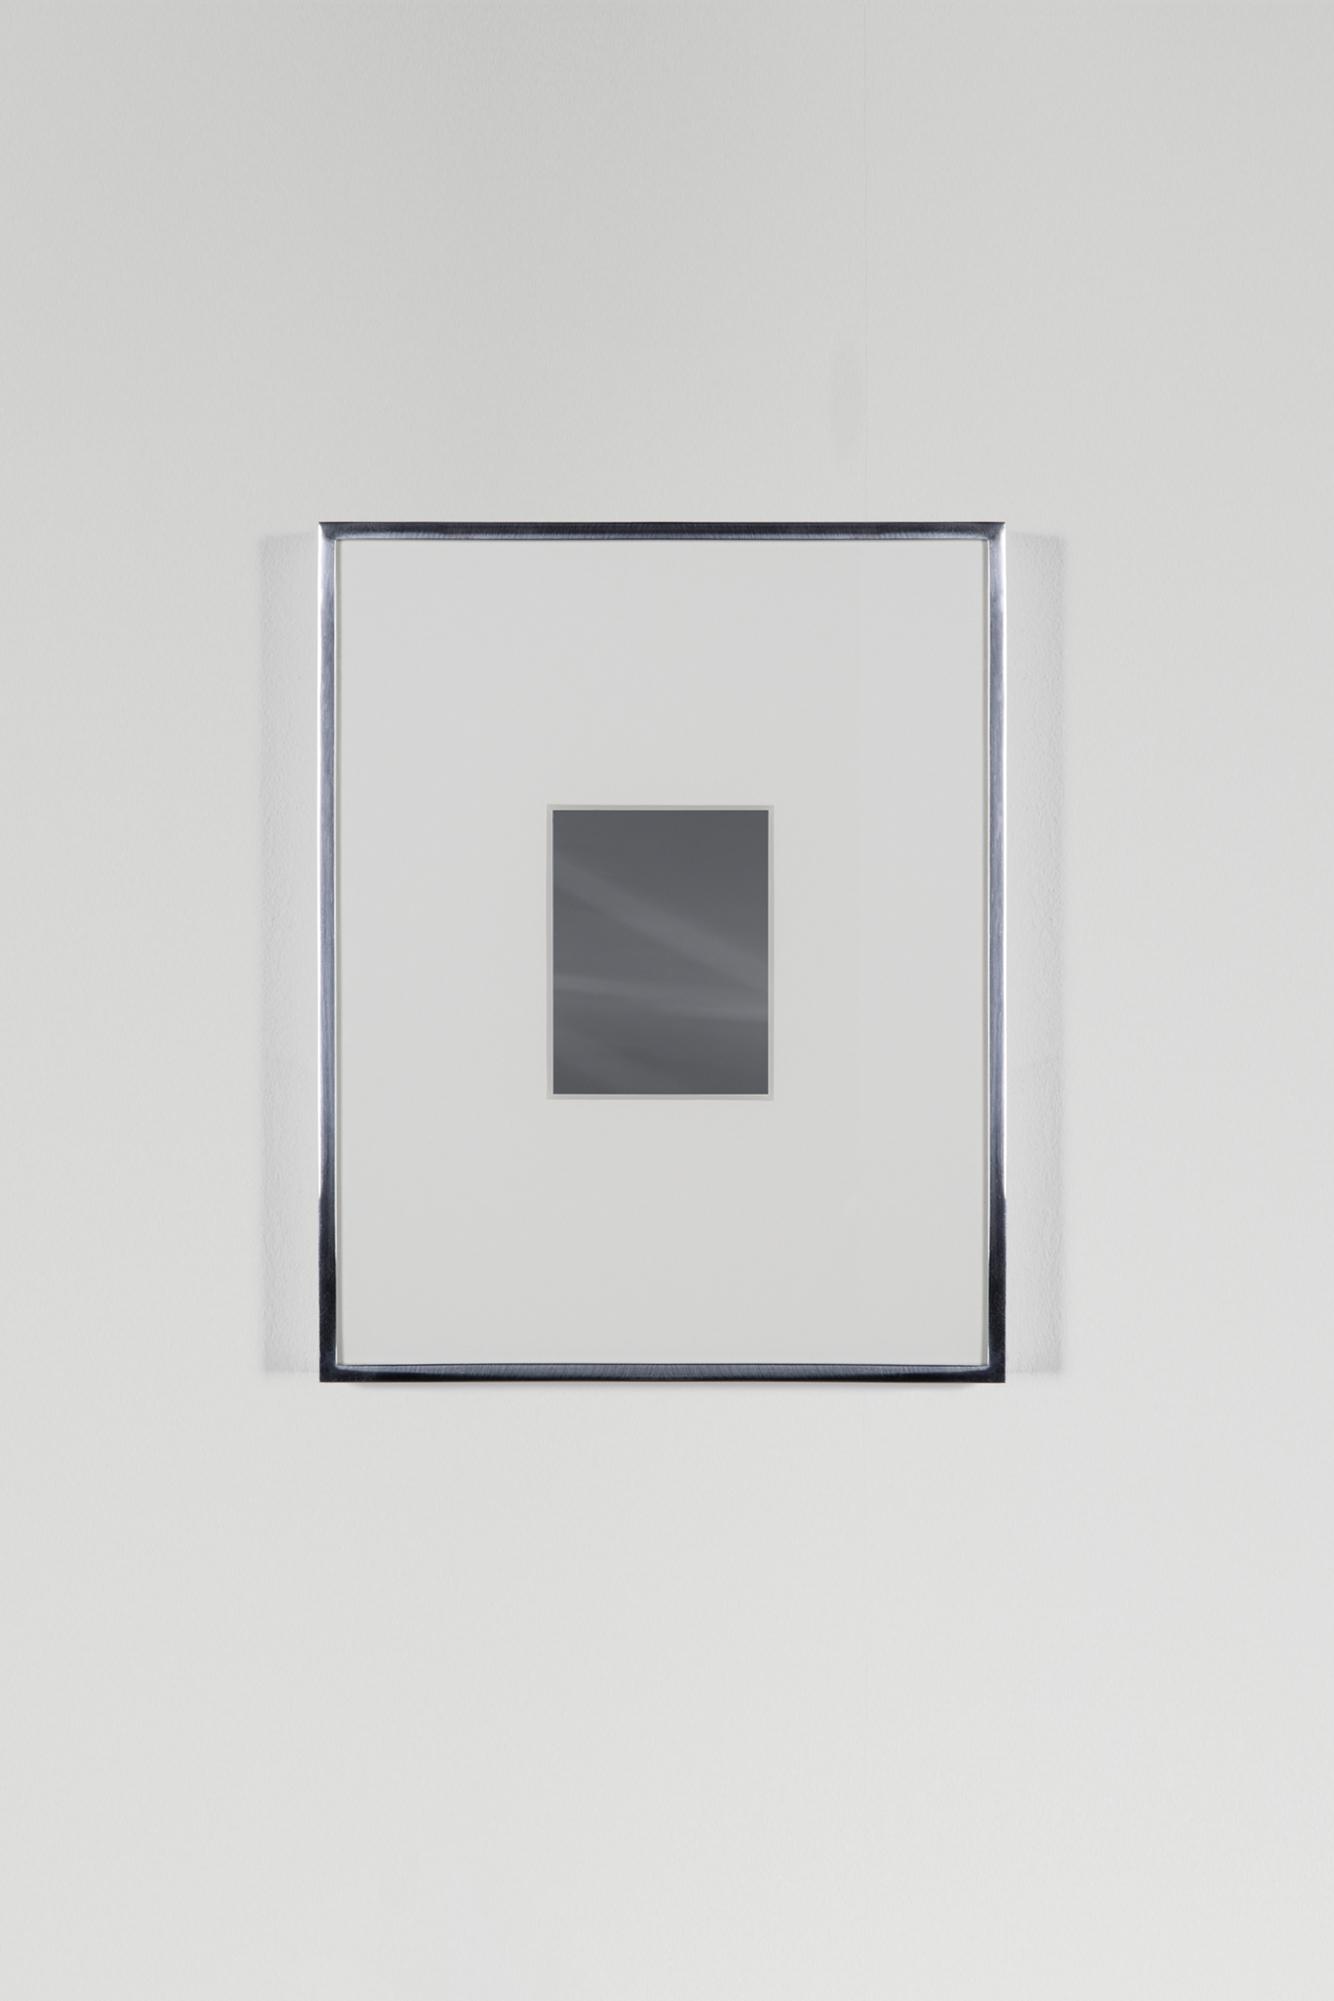 Transparency (Negative) [Kodak Portra 400NC Em. No. 1022: October 22–November 1, 2015 LAX/LHR/BEY BEY/GVA ZRH/FRA/SFO/LAX]    2017   Epson Ultrachrome K3 archival ink jet print on Museo Silver Rag Paper  14 x 11 inches   Transparencies, 2014–